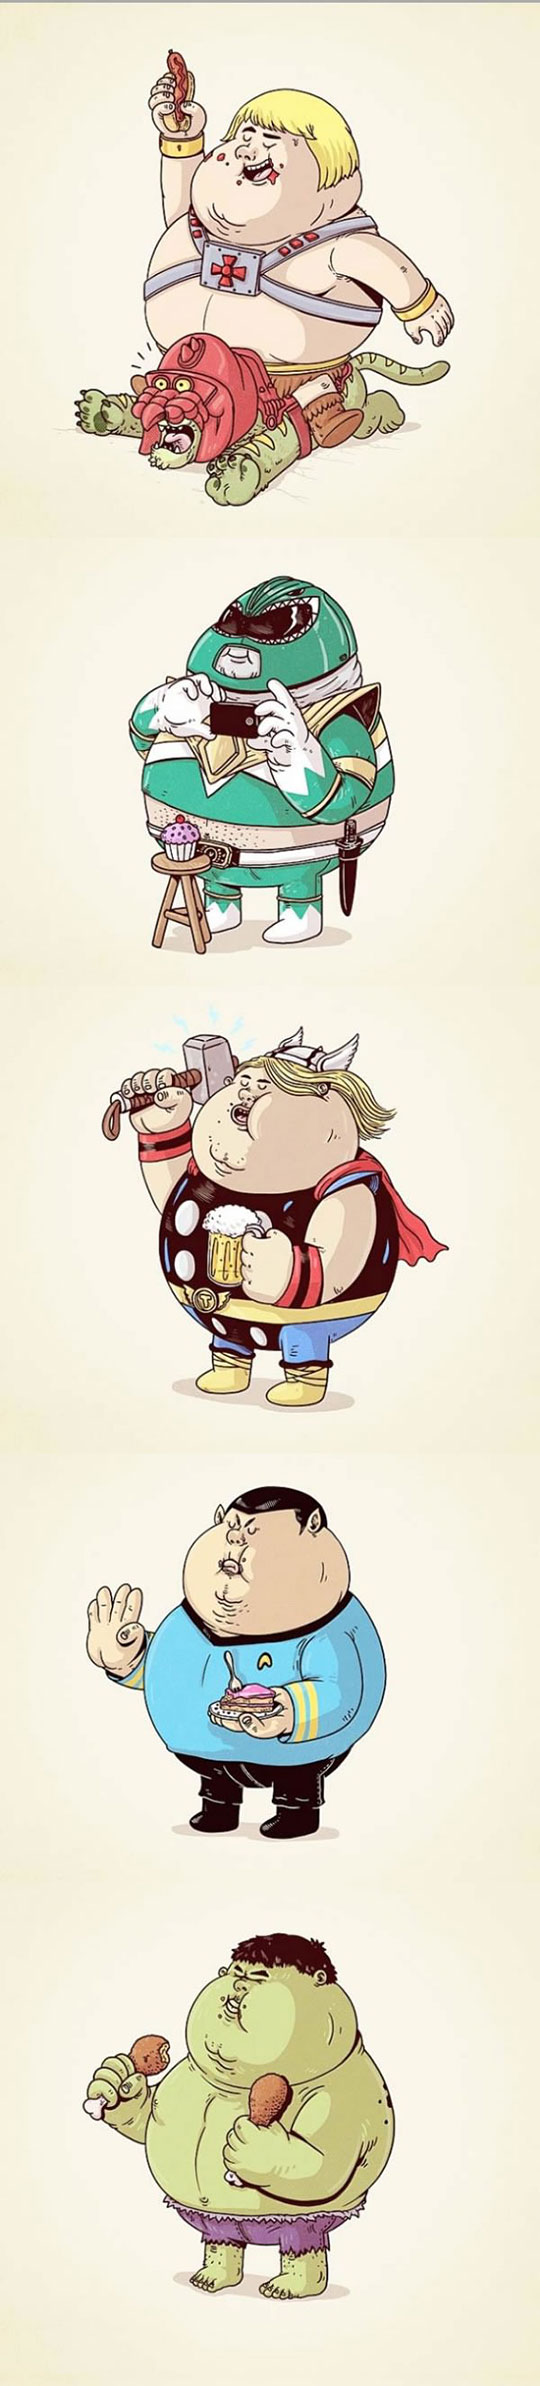 funny-fat-superheroes-Power-Rangers-Thor